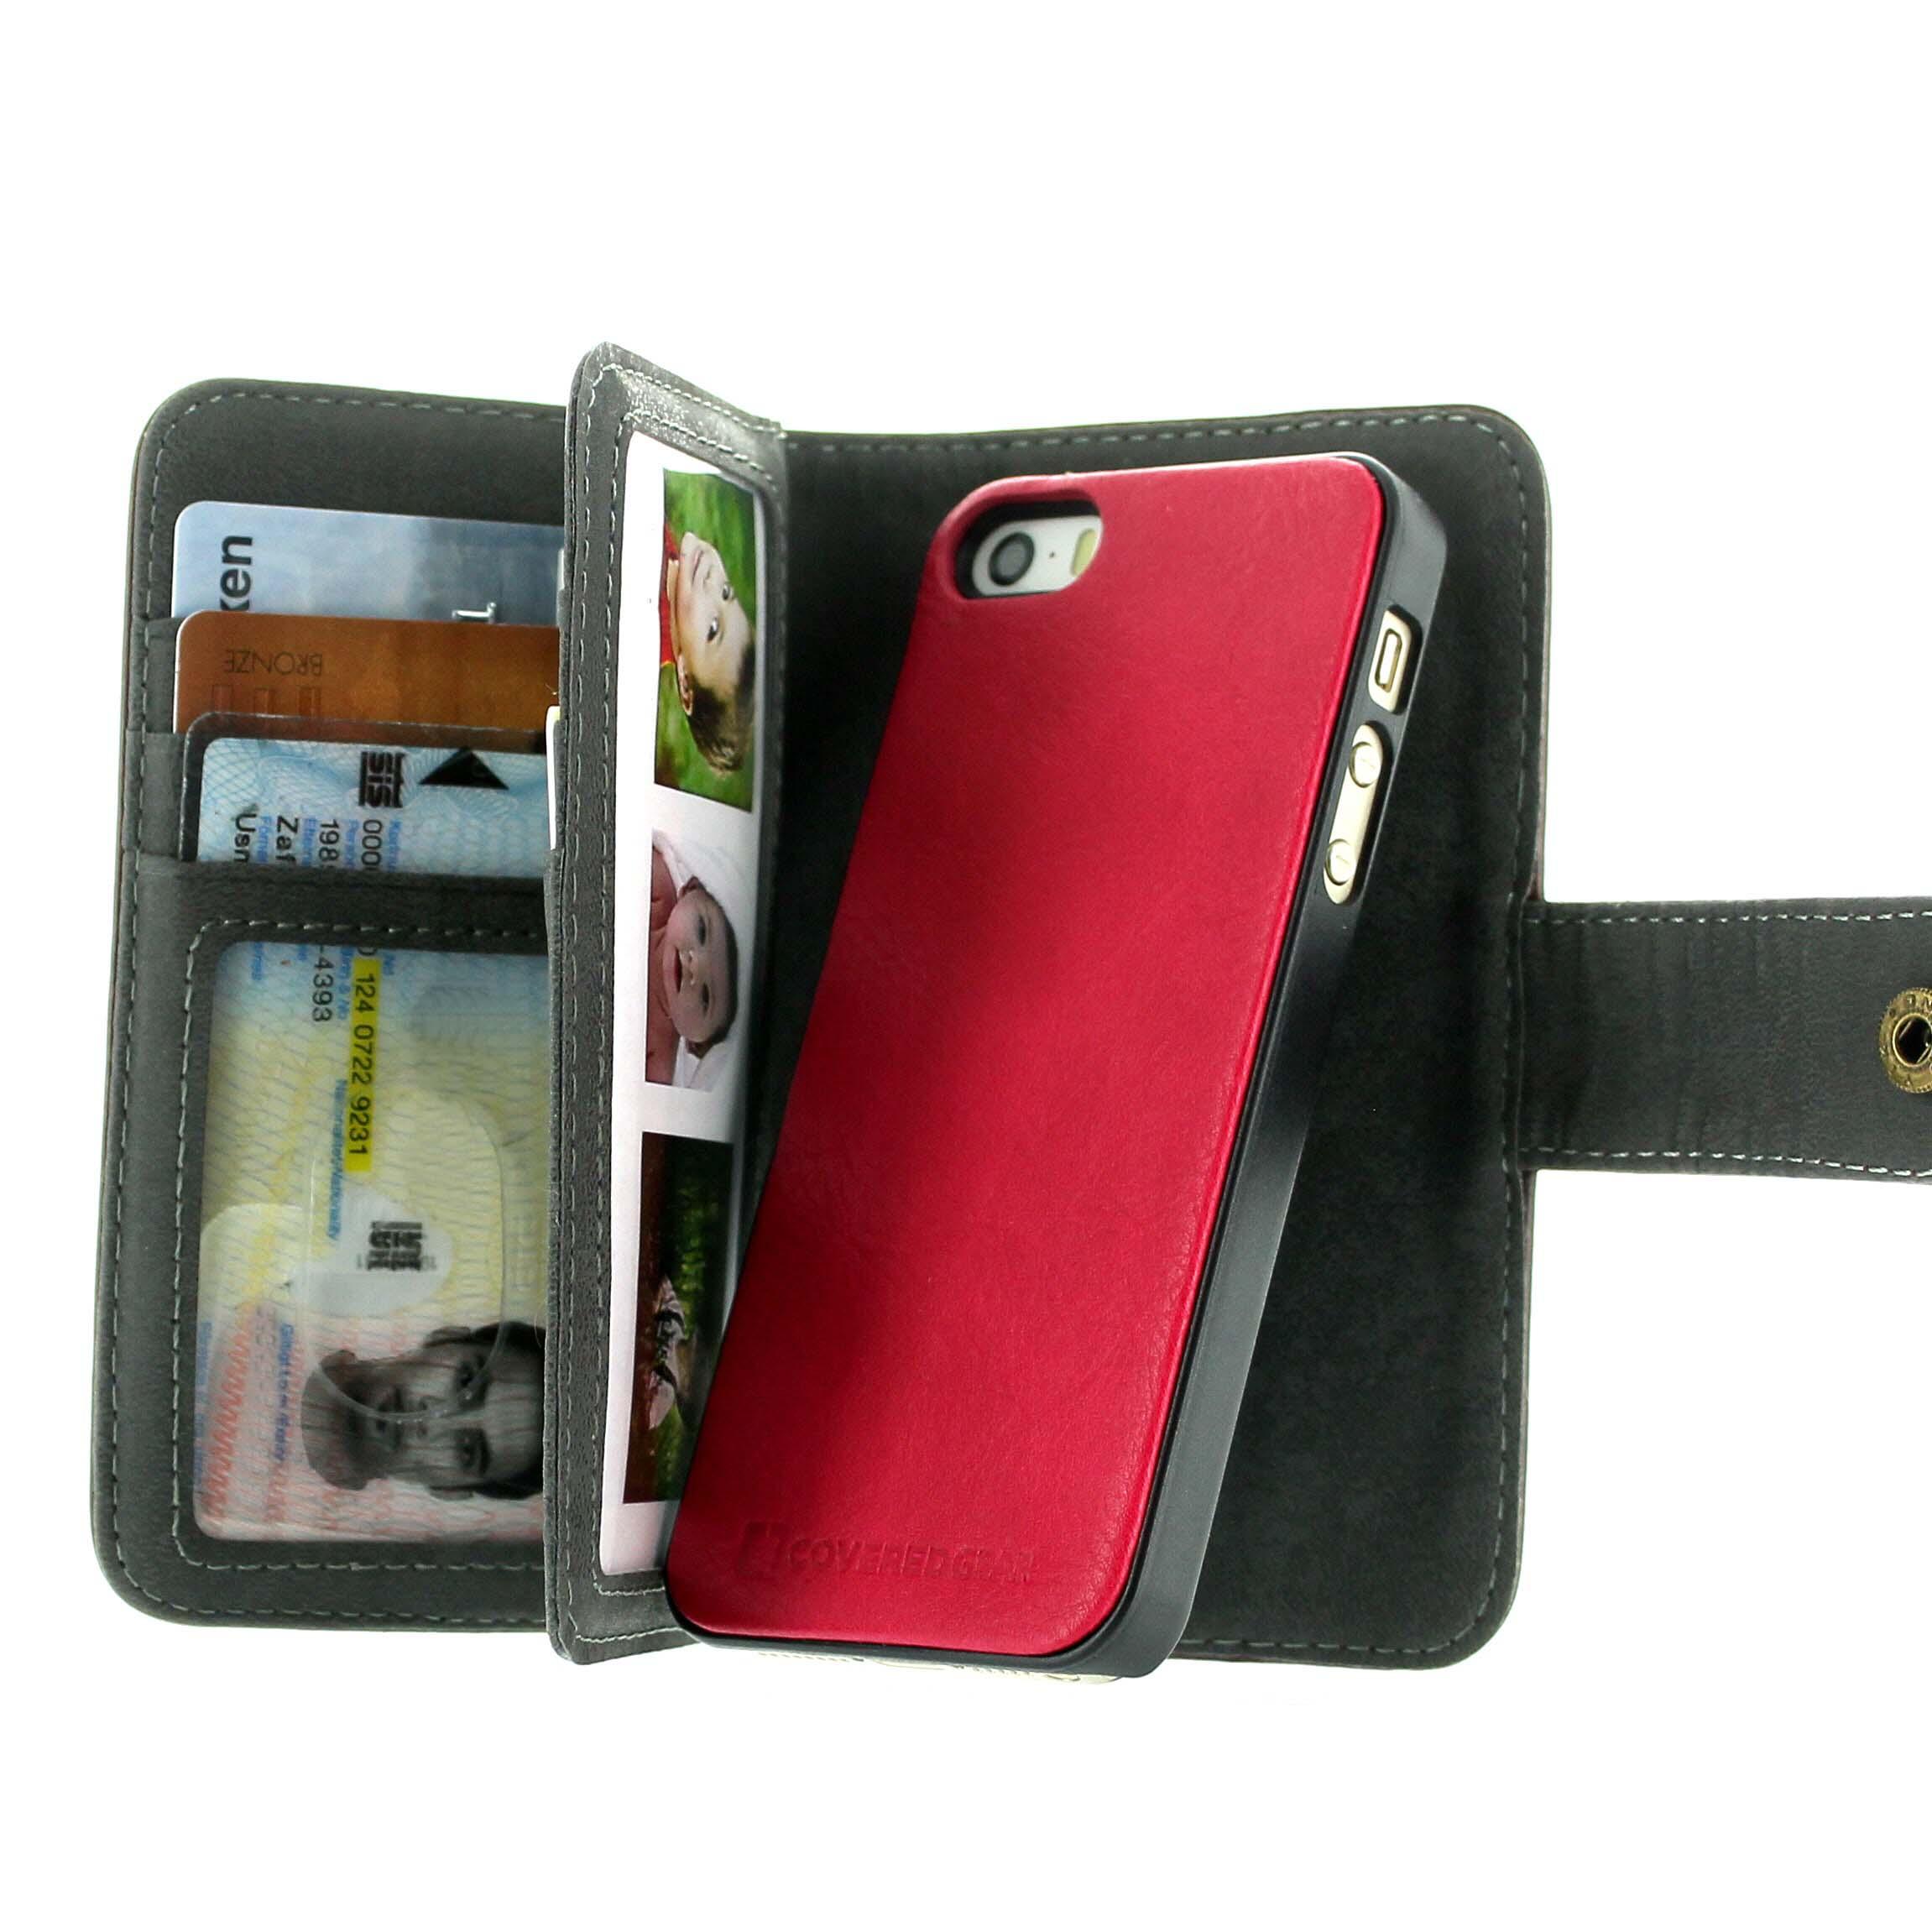 CoveredGear LifeStyle - Apple iPhone 5 5S SE - Rosa billigt online ... a202d23ea9f1c